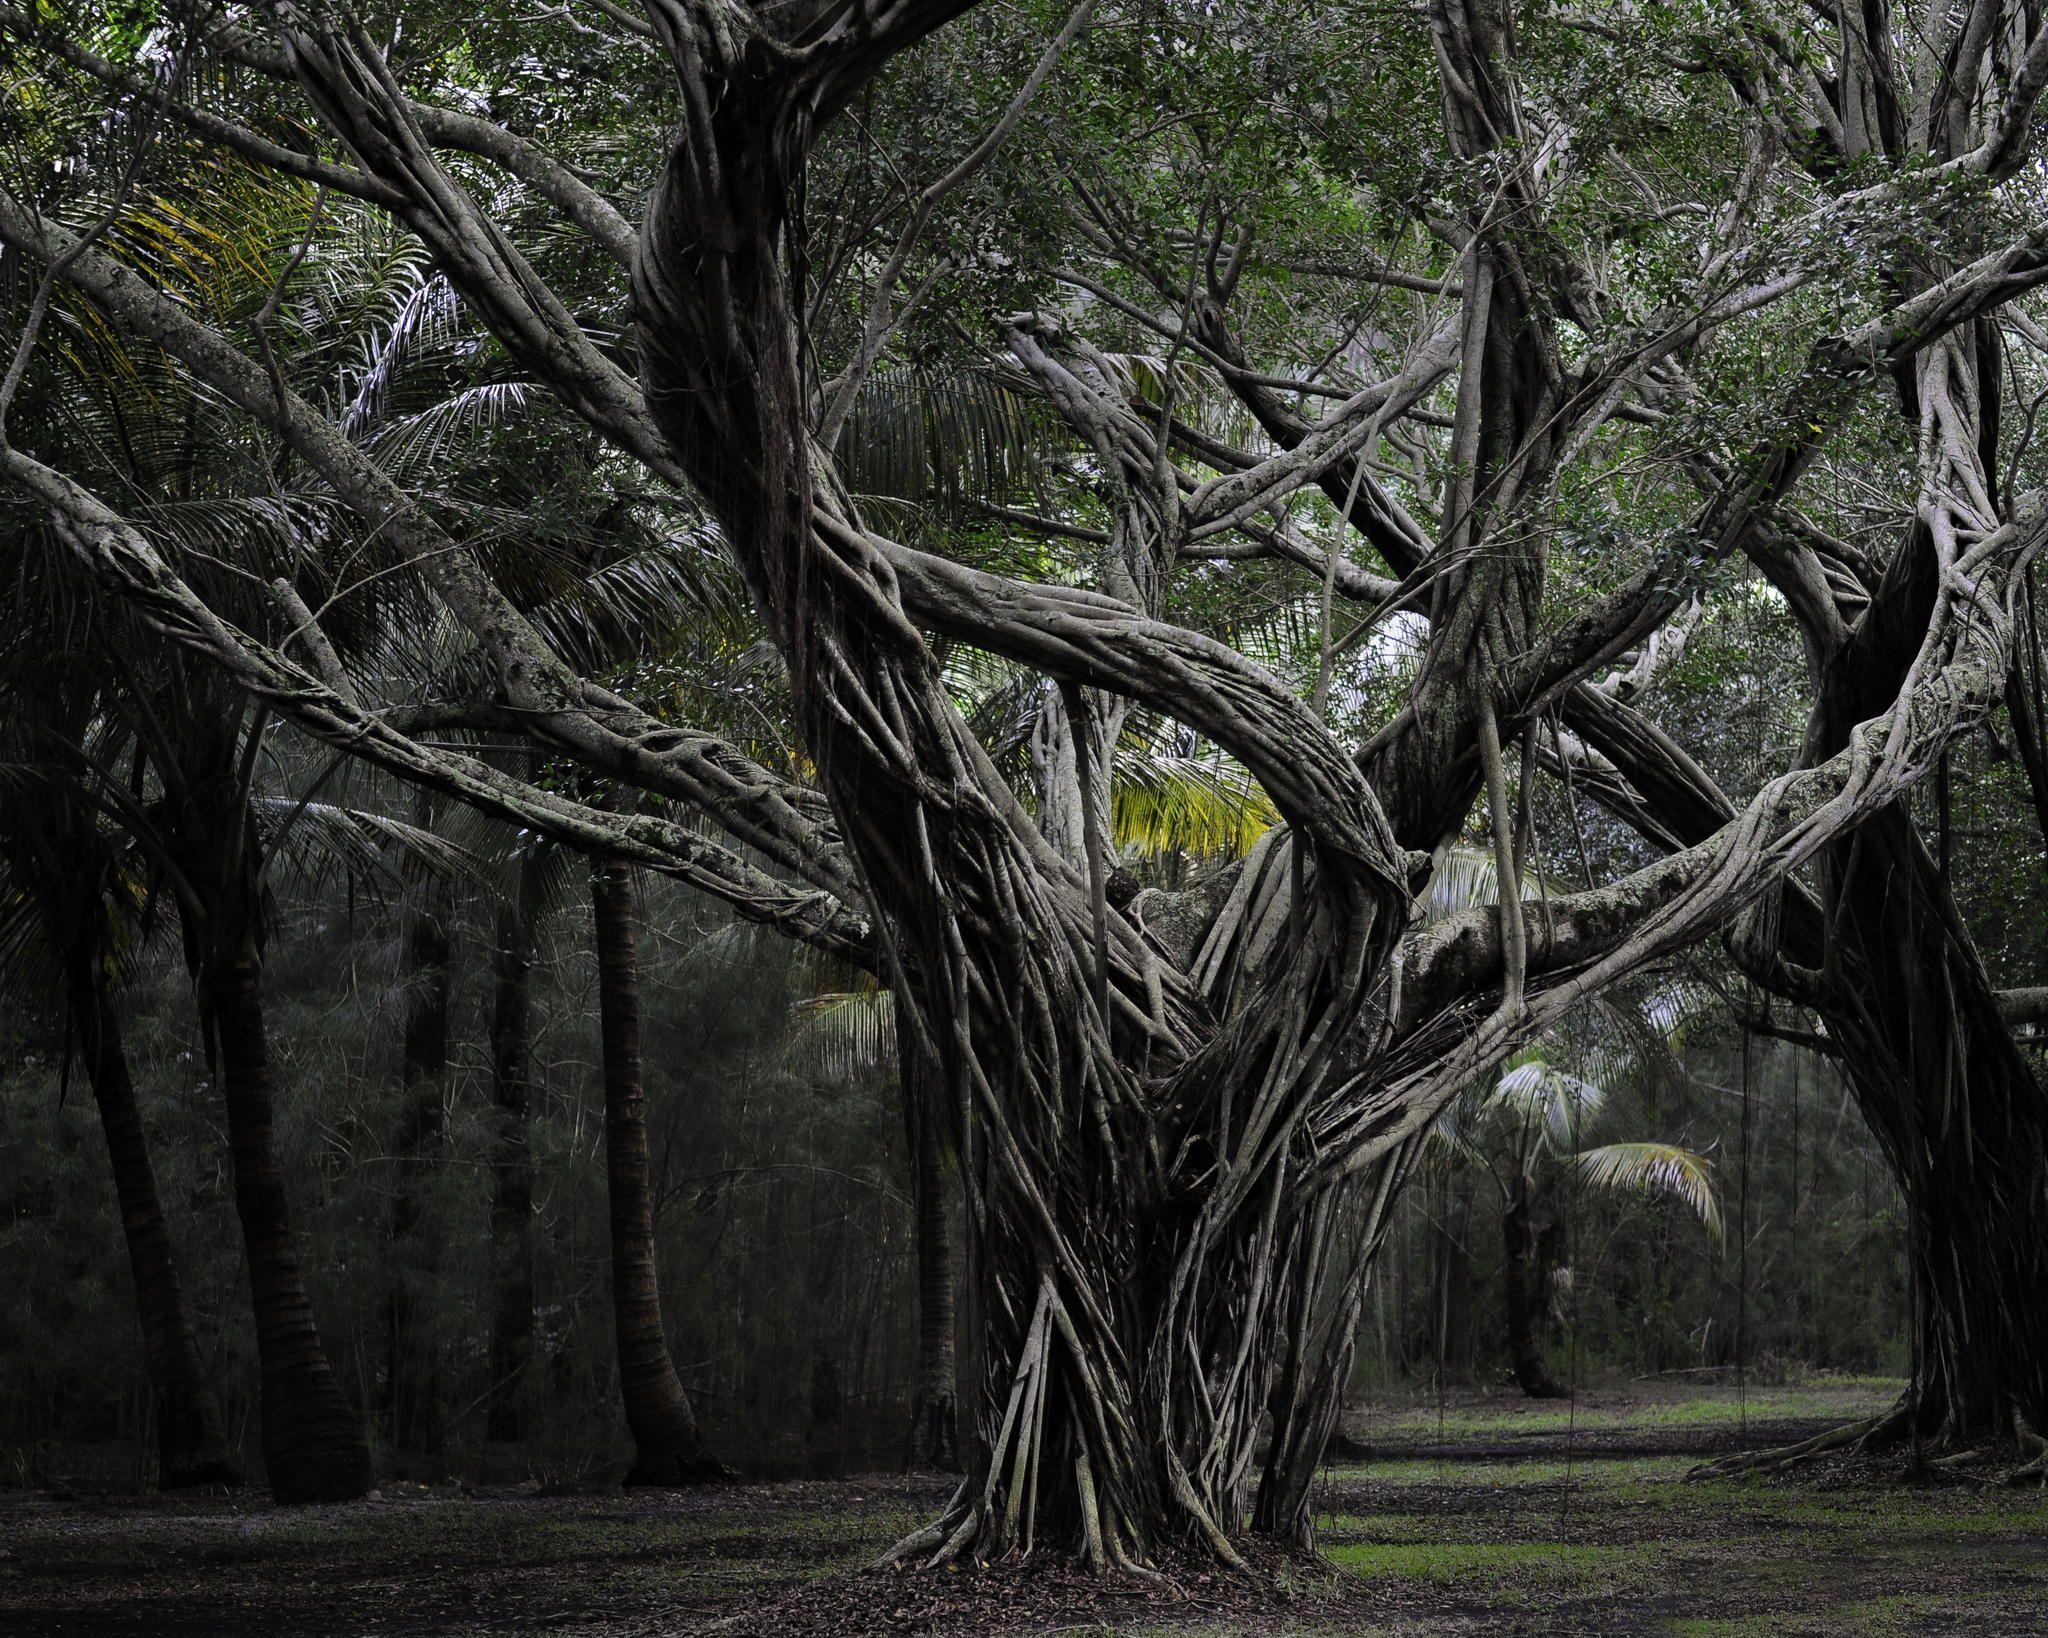 Jungle by Noah Rosen on 500px